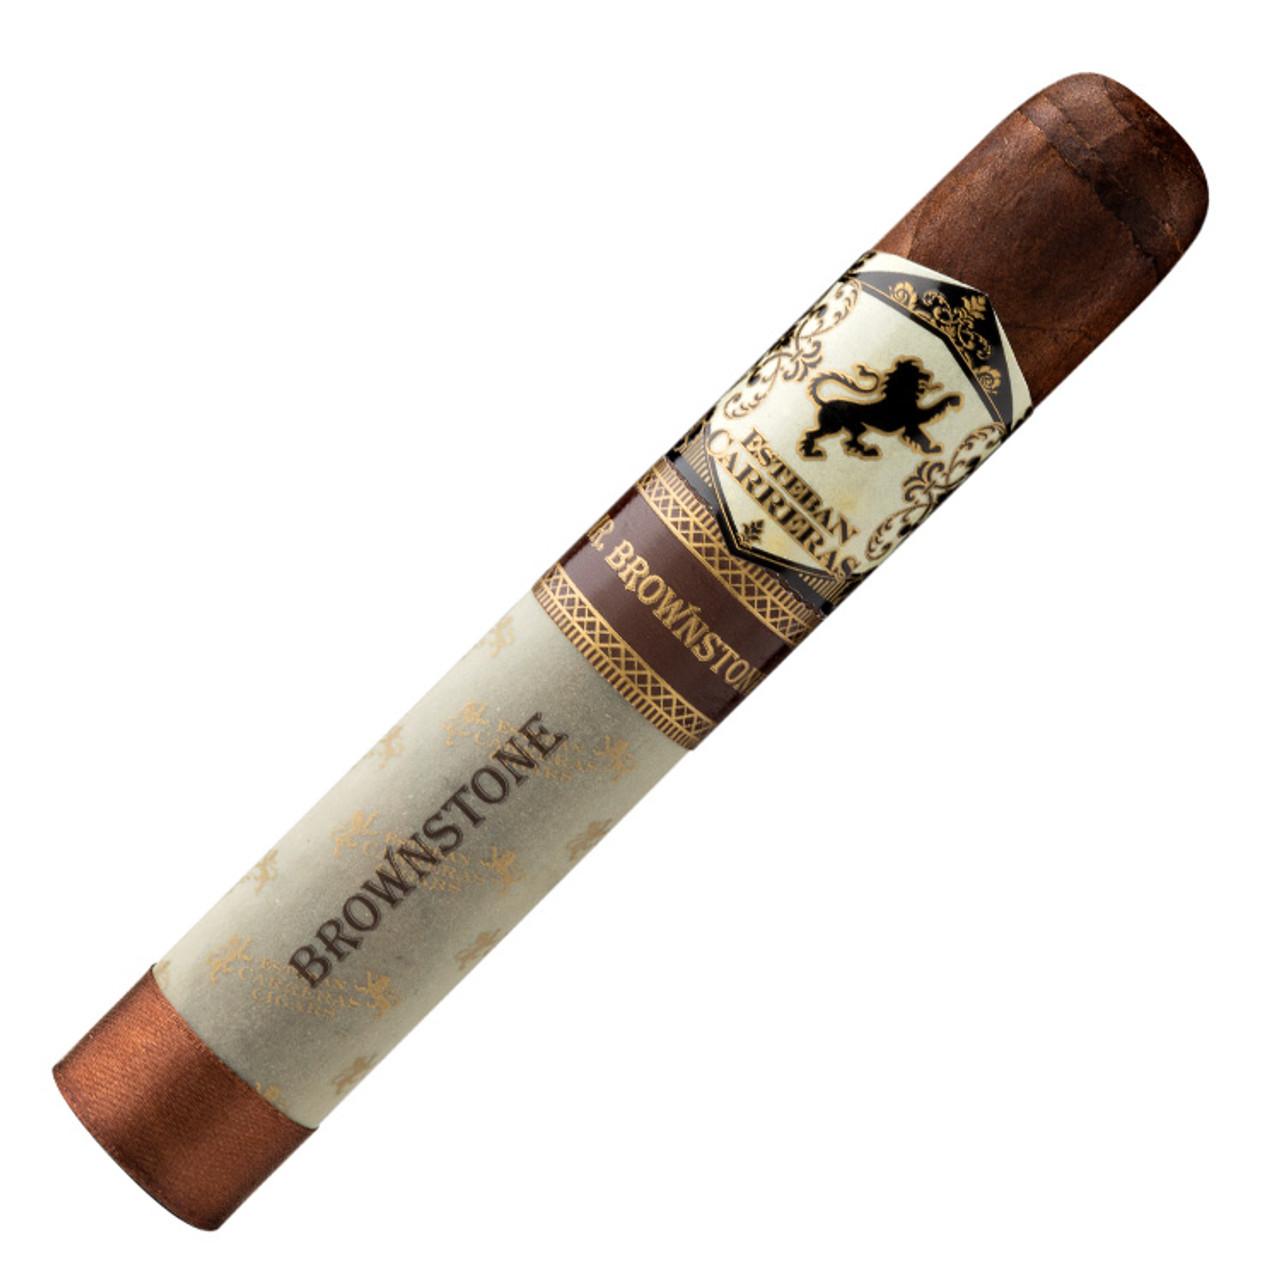 Esteban Carreras Mr. Brownstone Sixty Cigars - 6 x 60 (Box of 20)